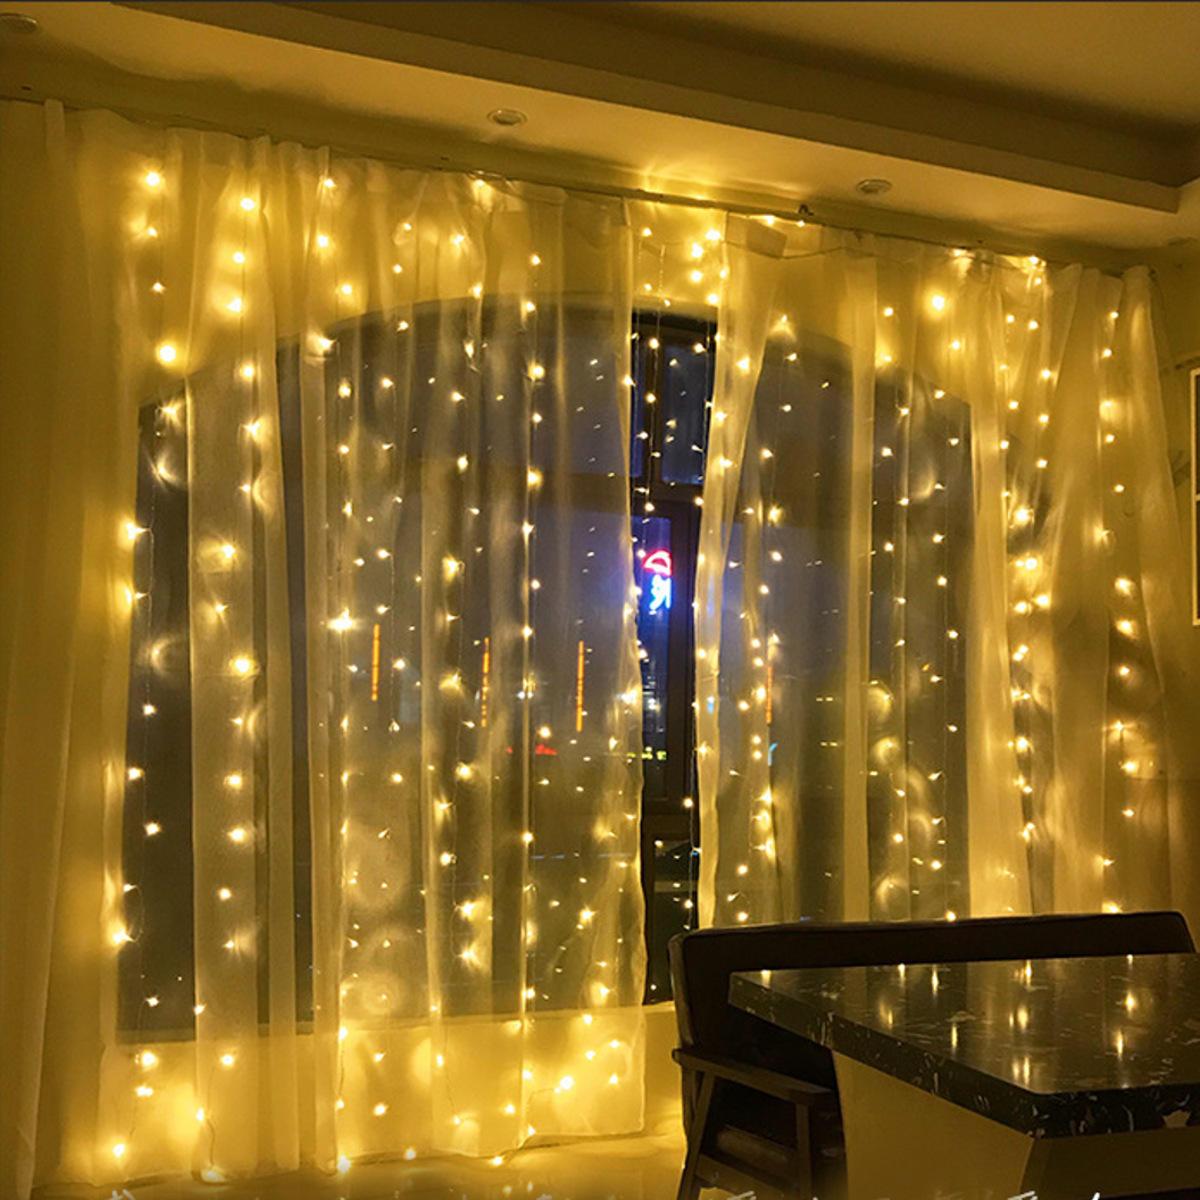 6Mx3M AC220V EU Plug LED Curtain String Light Organza Backdrop for Weddings Birthday Party Events Display